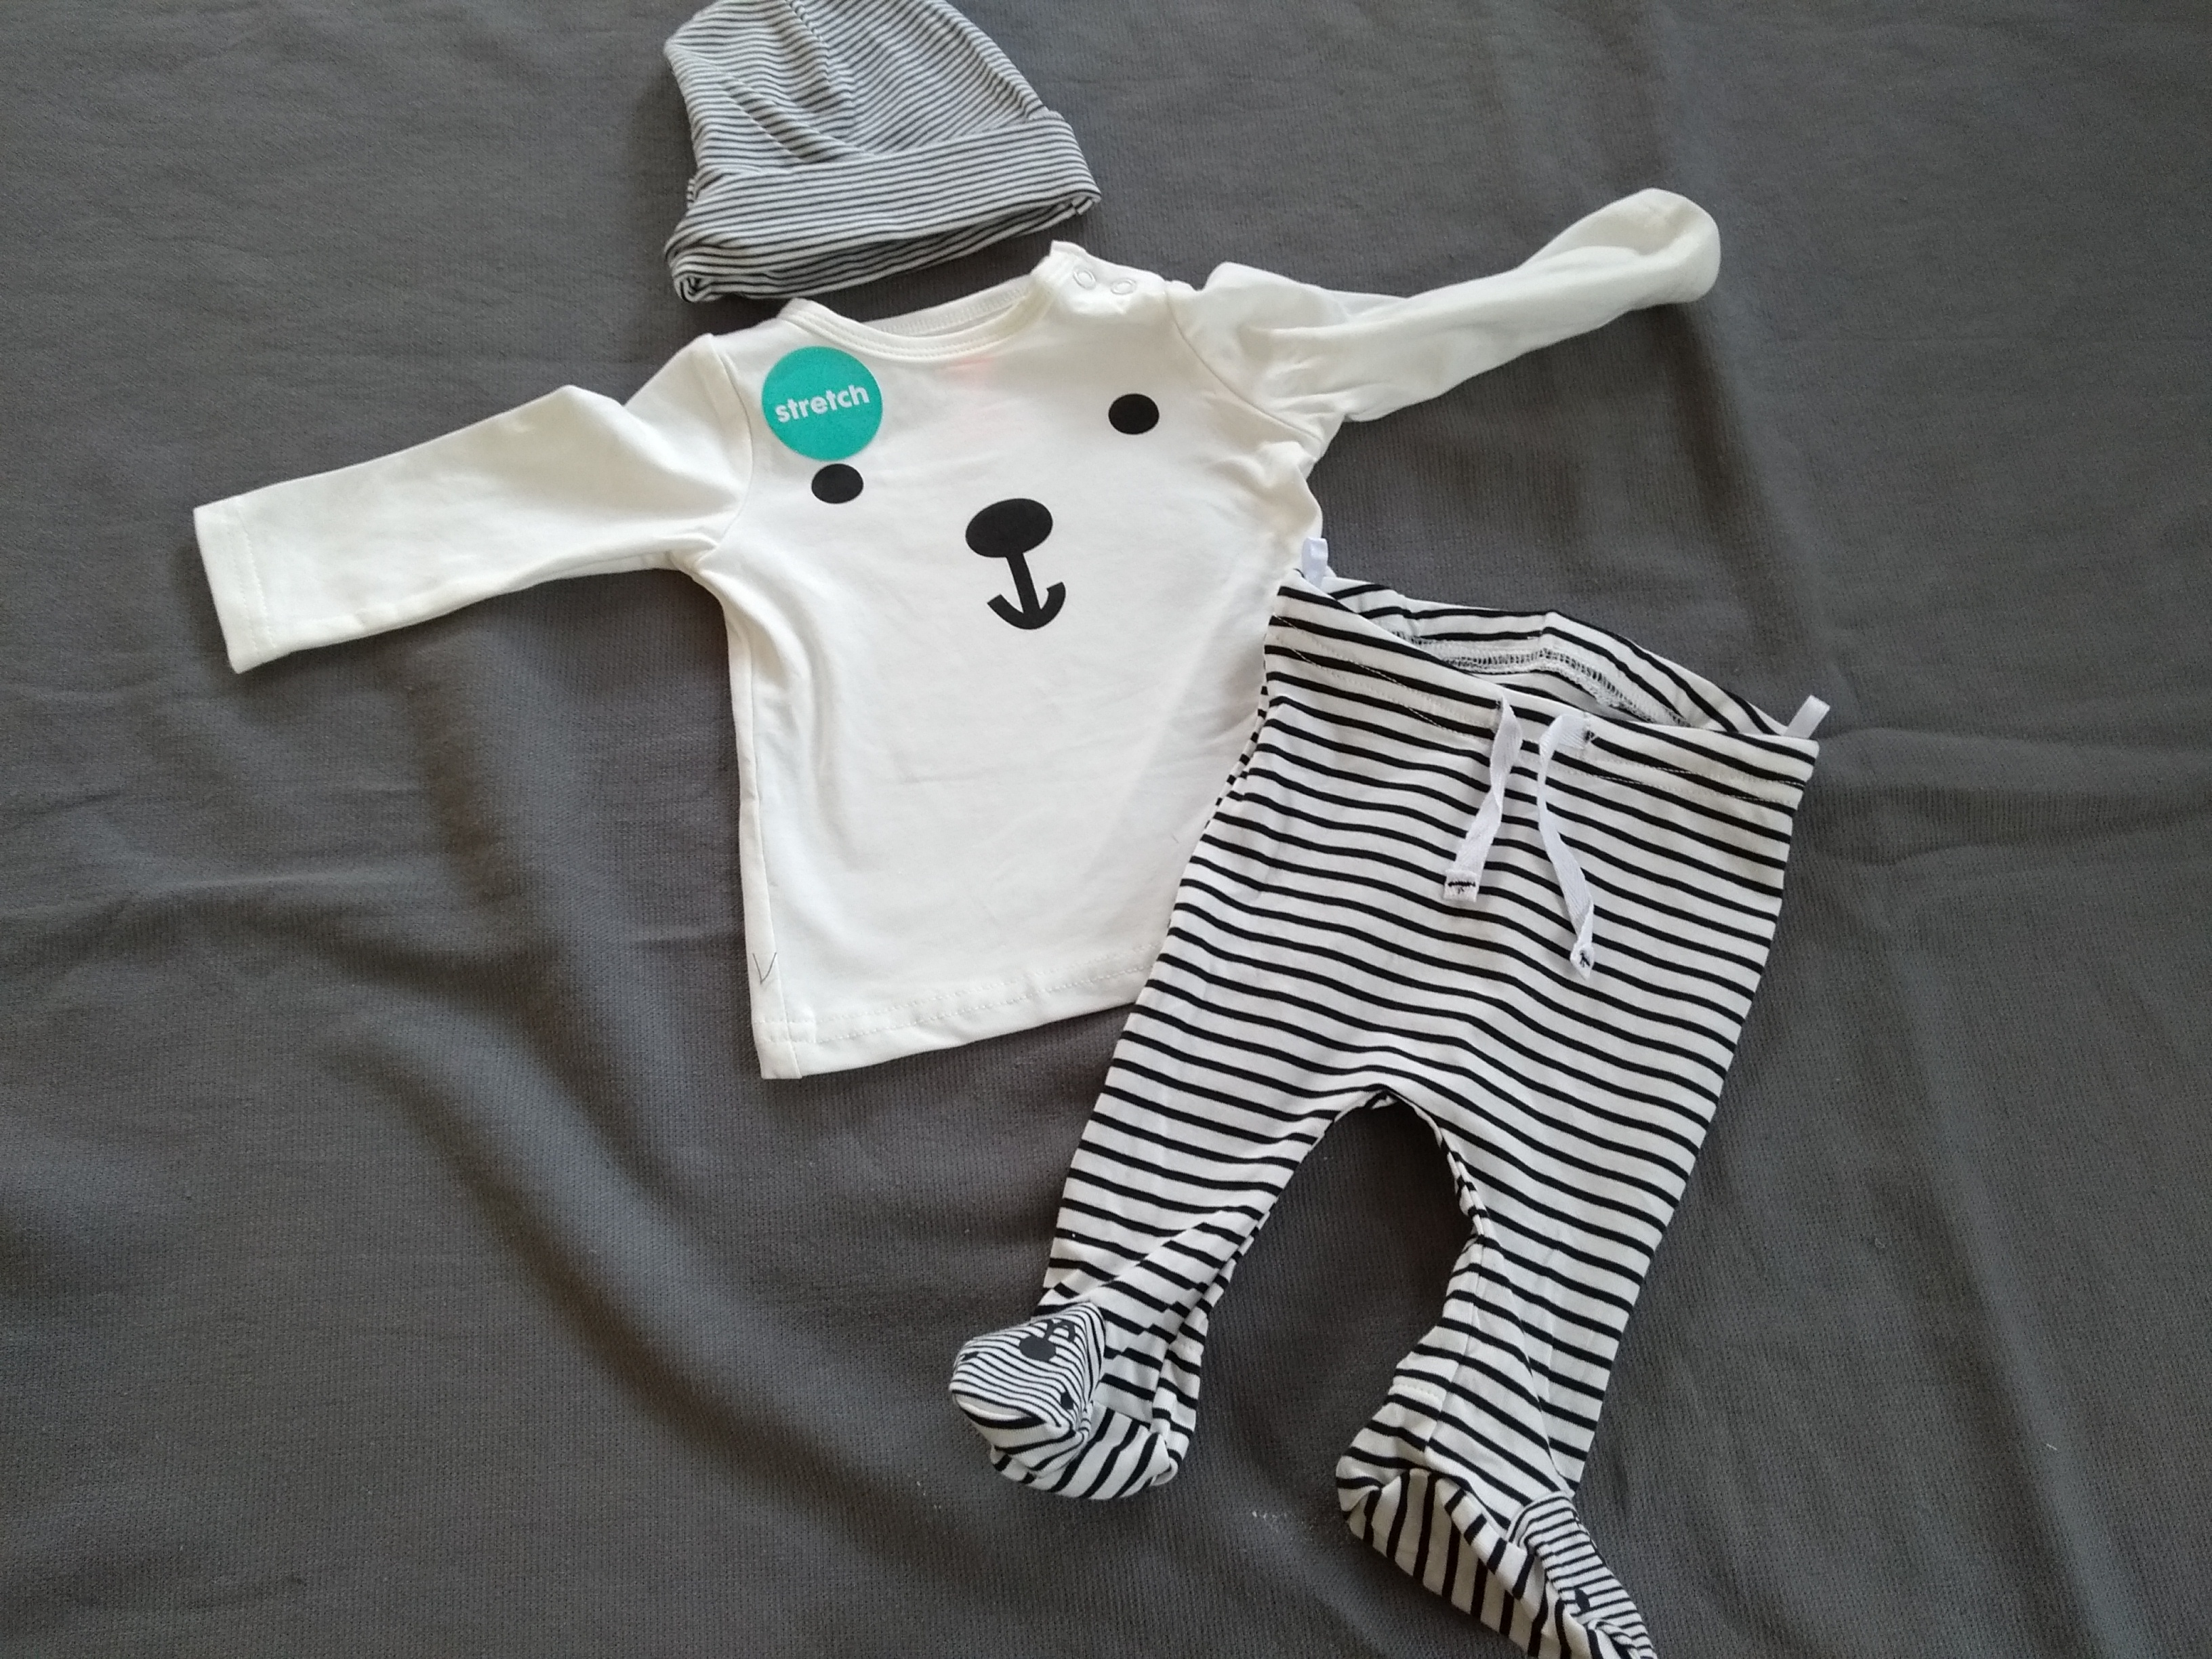 shoplog, action, hema, zeeman, nieuwe items, basics, shoppen, kleding, kleren, winkelen, mamablog, mamalifestyle, blog, mamablogger, lalog.nl, lalogblog